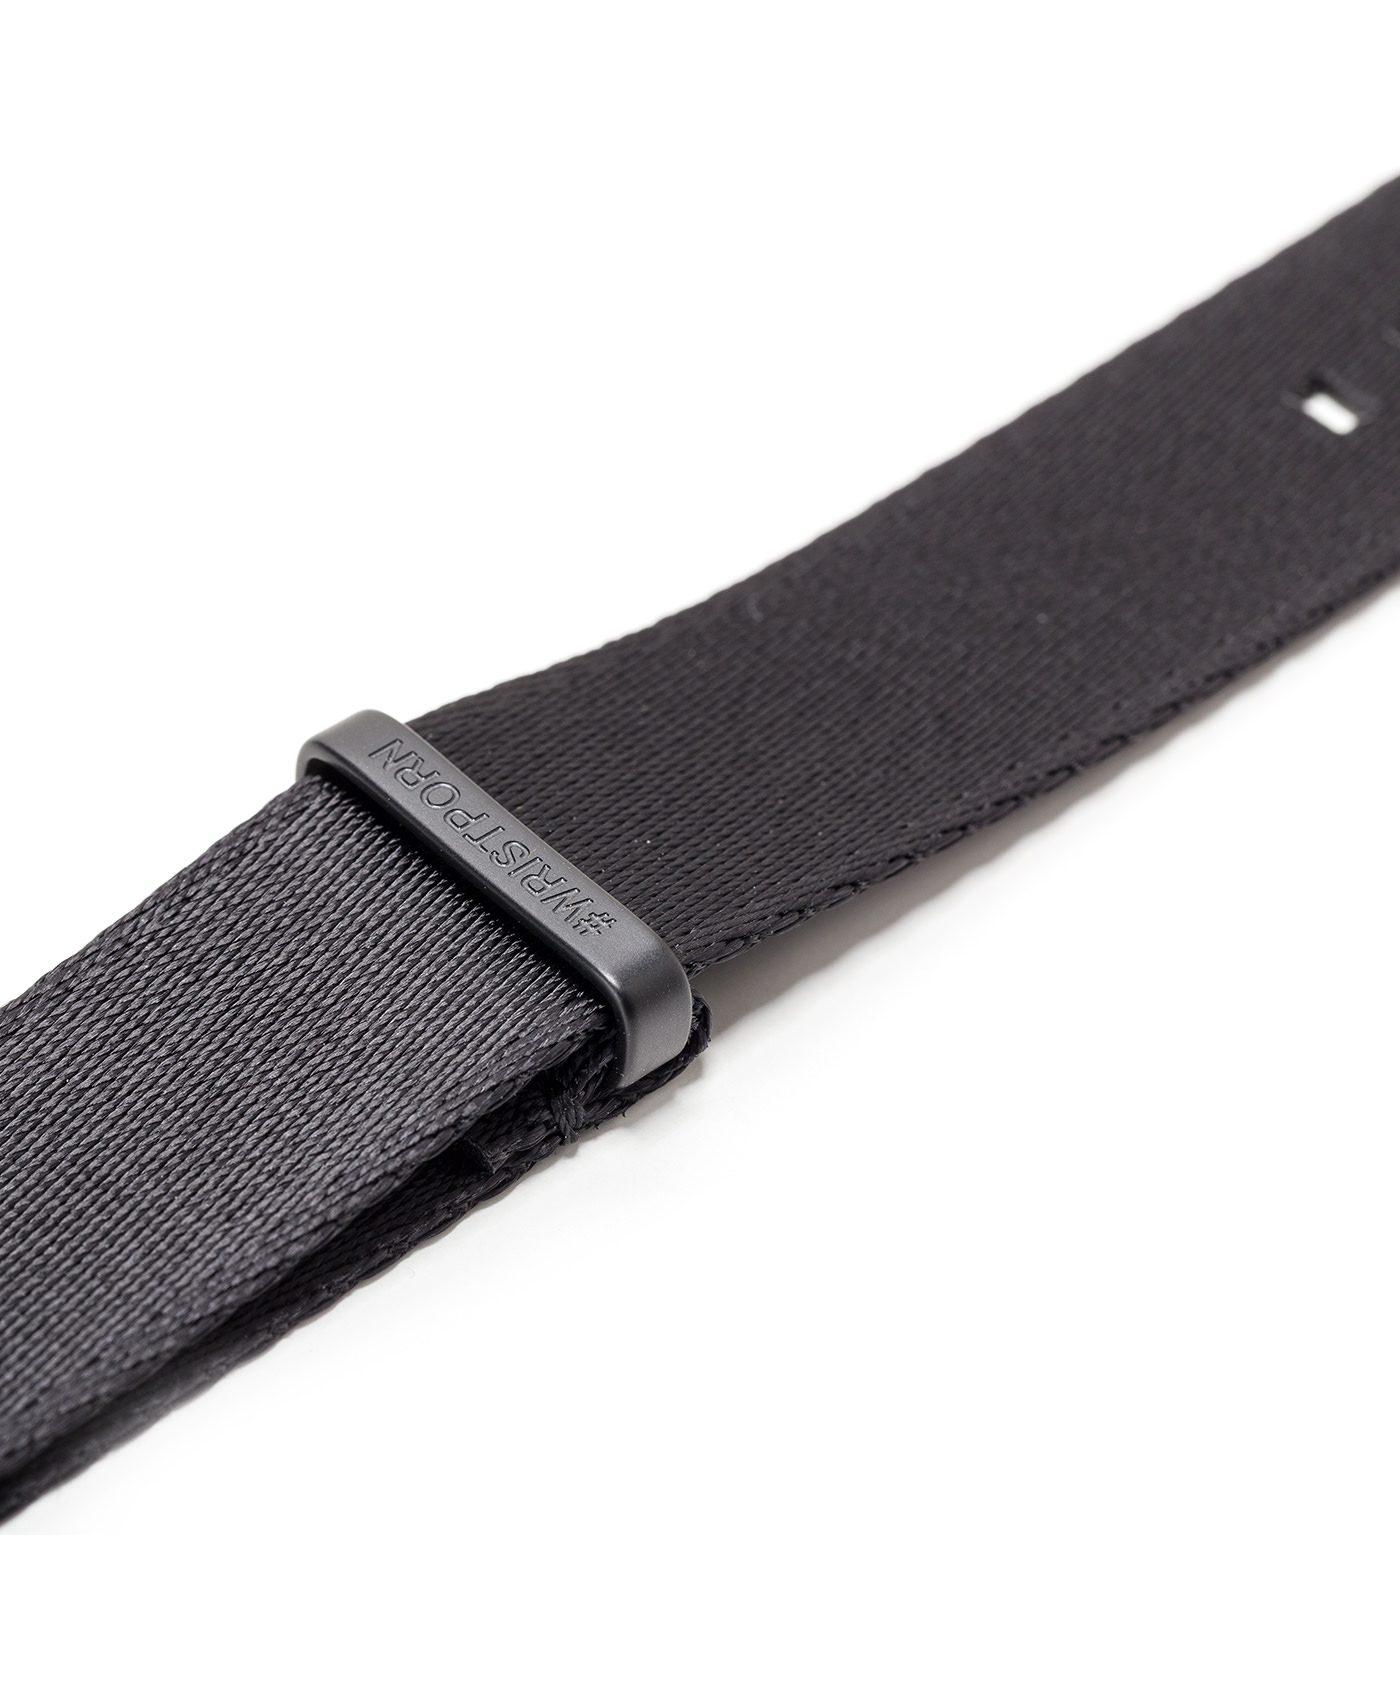 Watchbandit WB original Wristporn Nato strap in black with black buckle close up